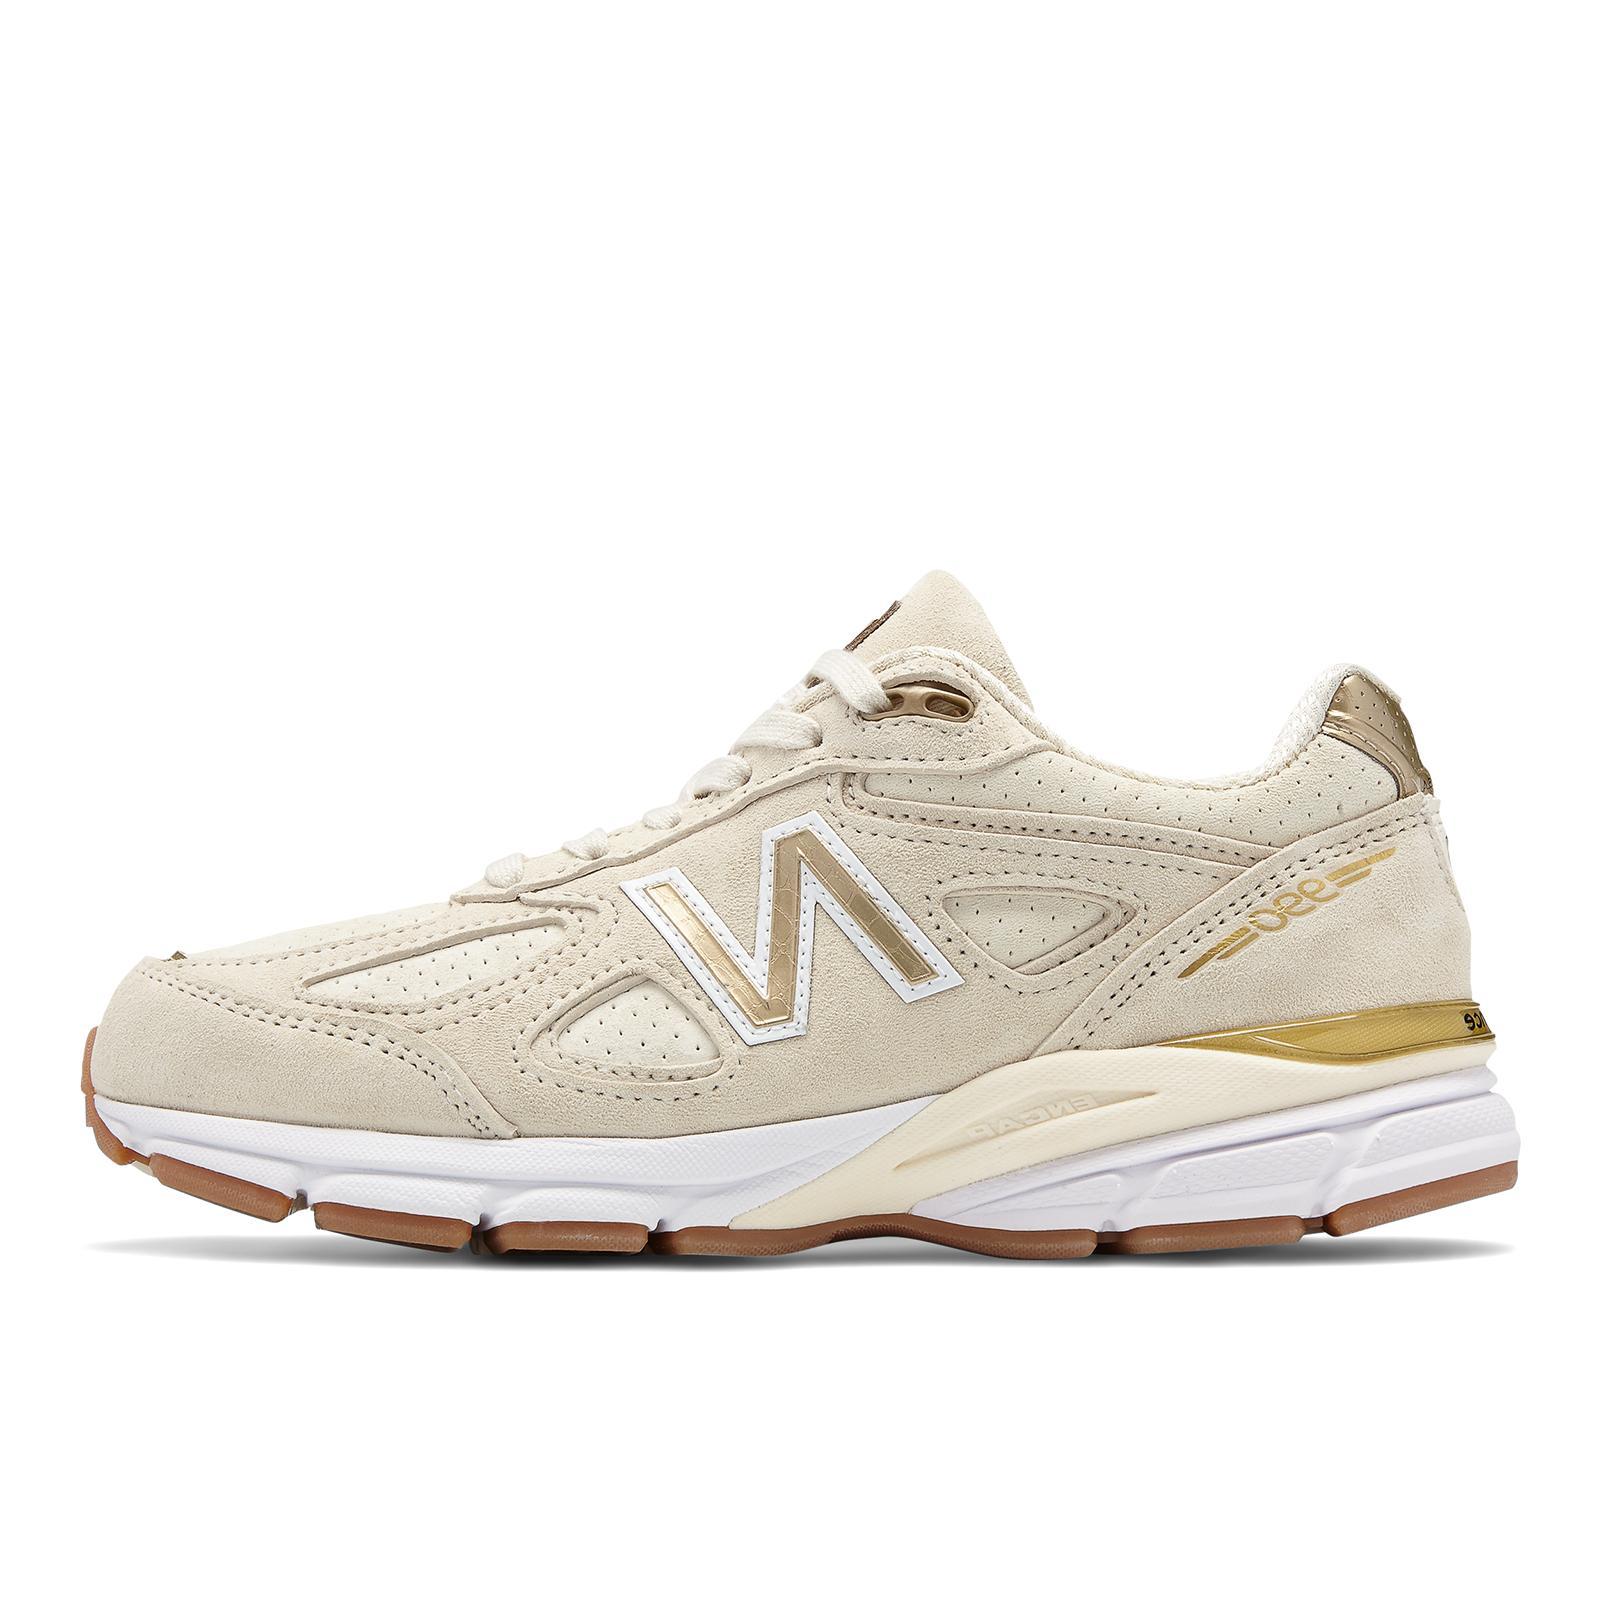 Men's New Balance 990 v4 Running Shoes Angora Sizes 8.5-14